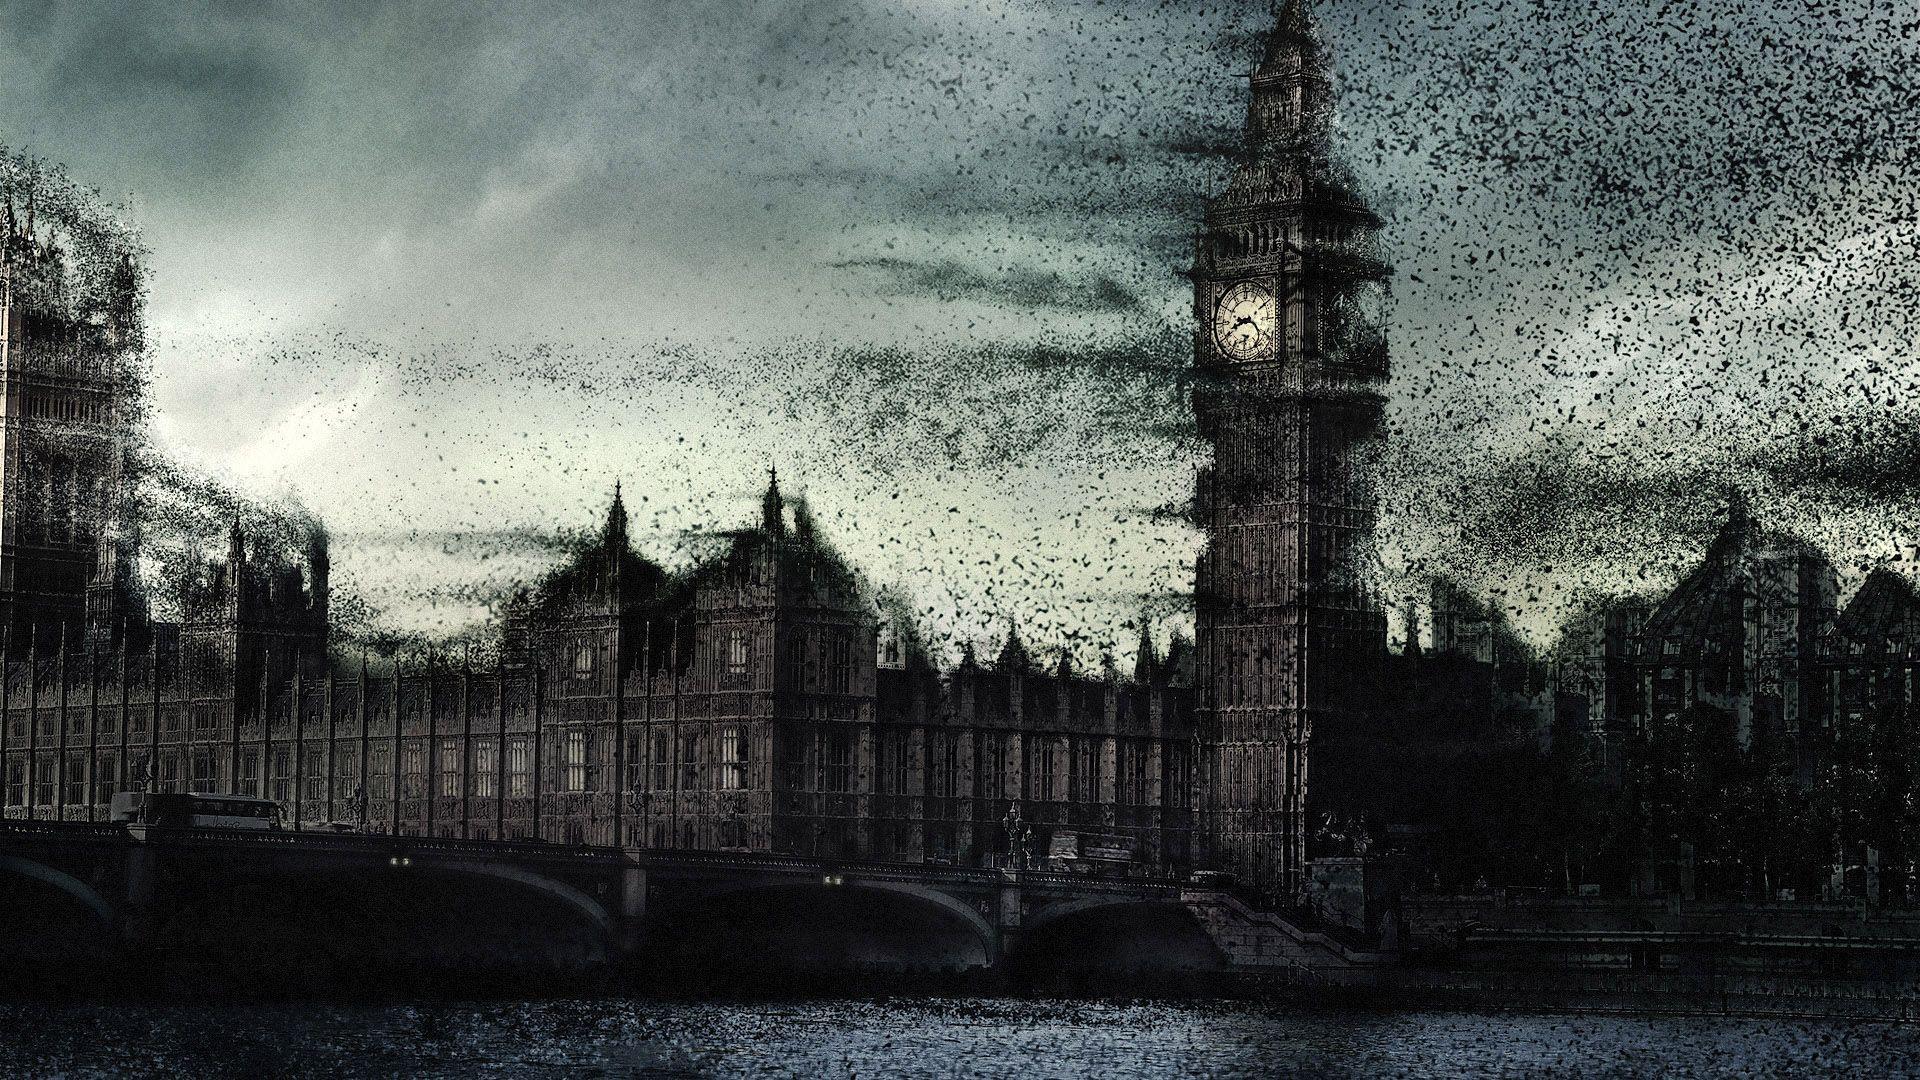 Dark City Backgrounds 1920x1080